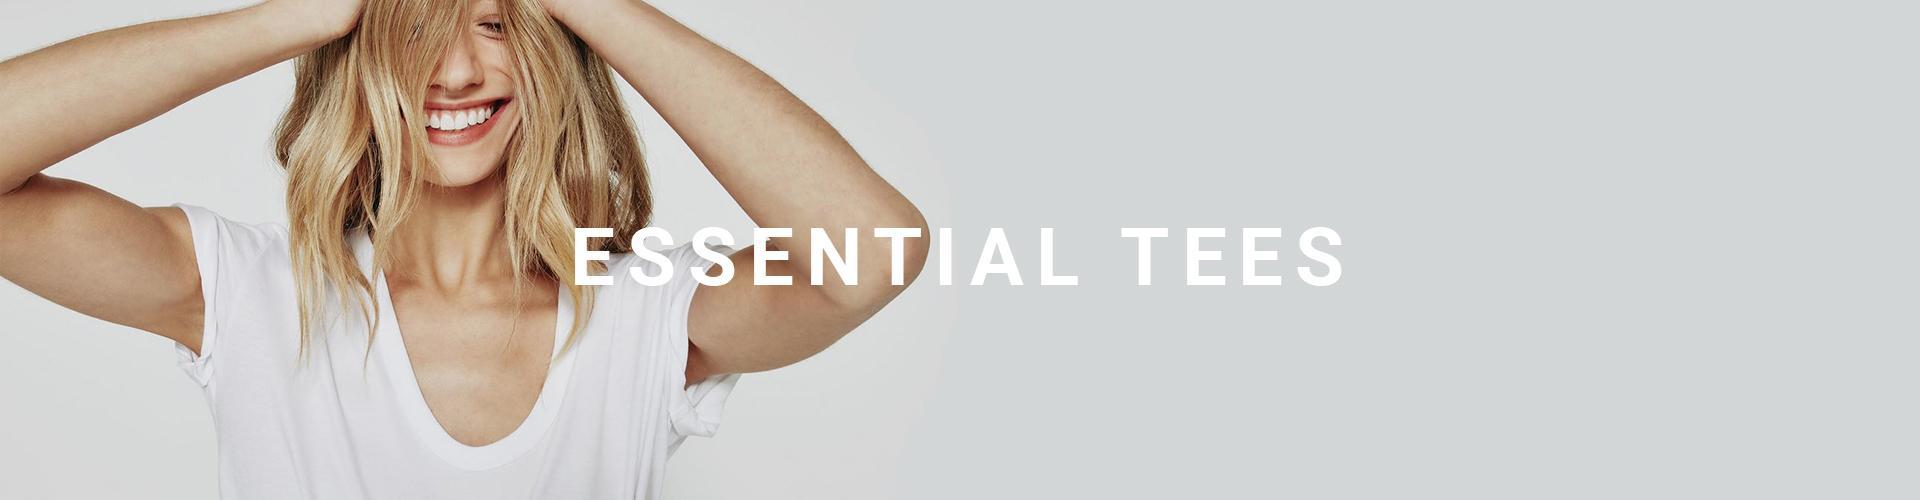 Shop women's essential tees on Big Star Denim